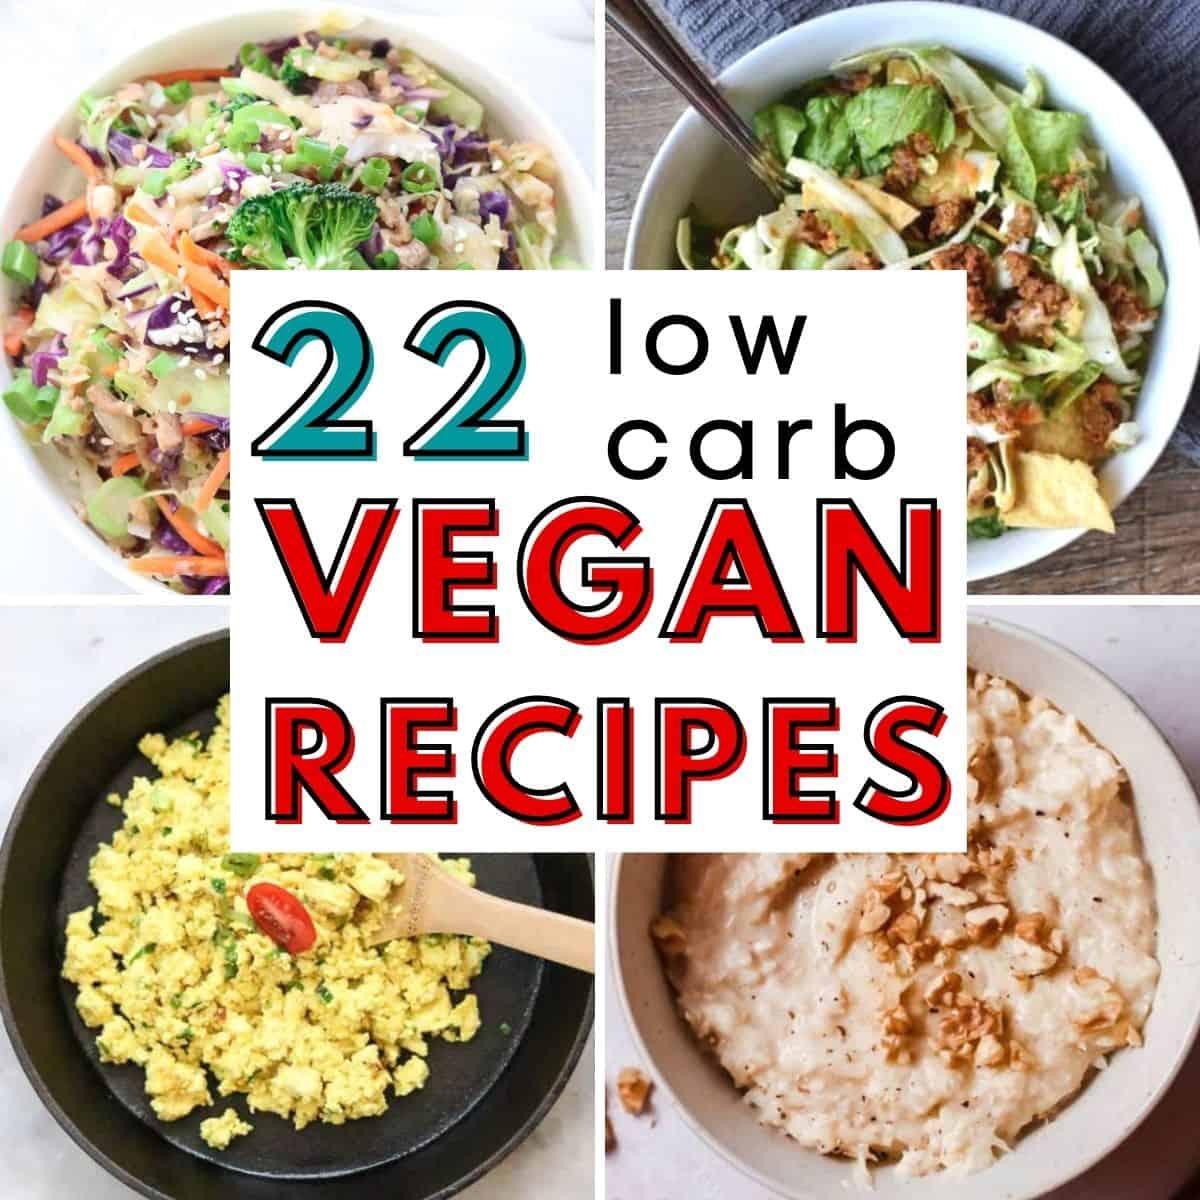 collage of low carb vegan recipes photos